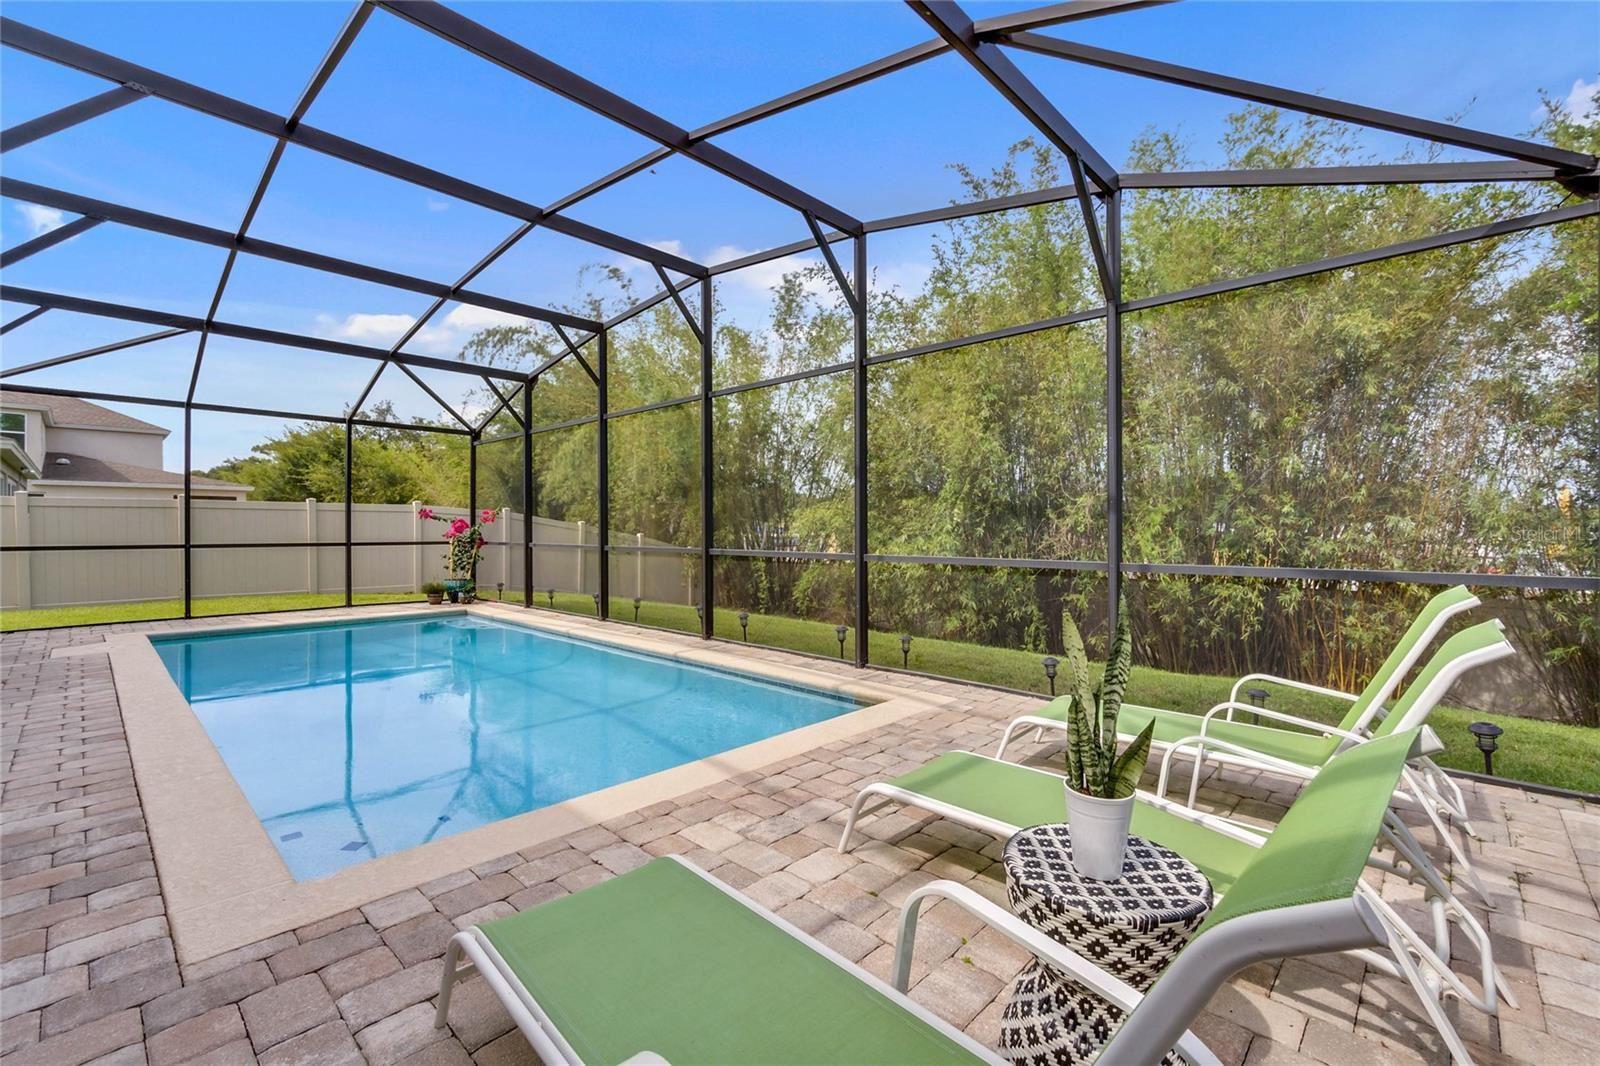 Photo of 14883 GOLDEN SUNBURST AVENUE, ORLANDO, FL 32827 (MLS # O5953331)